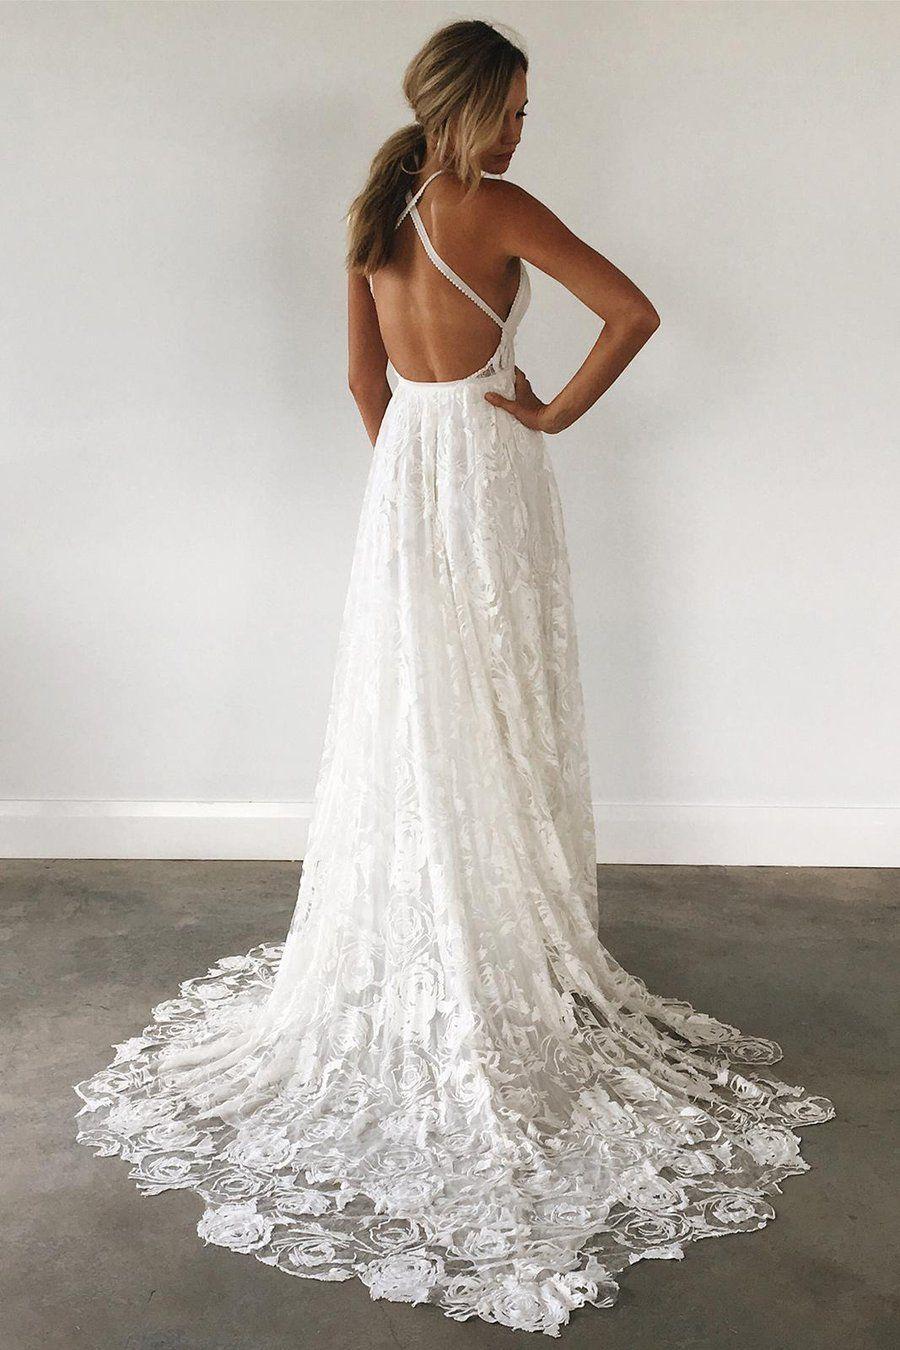 Thigh split sky blue rustic wedding dresses beach wedding gown with